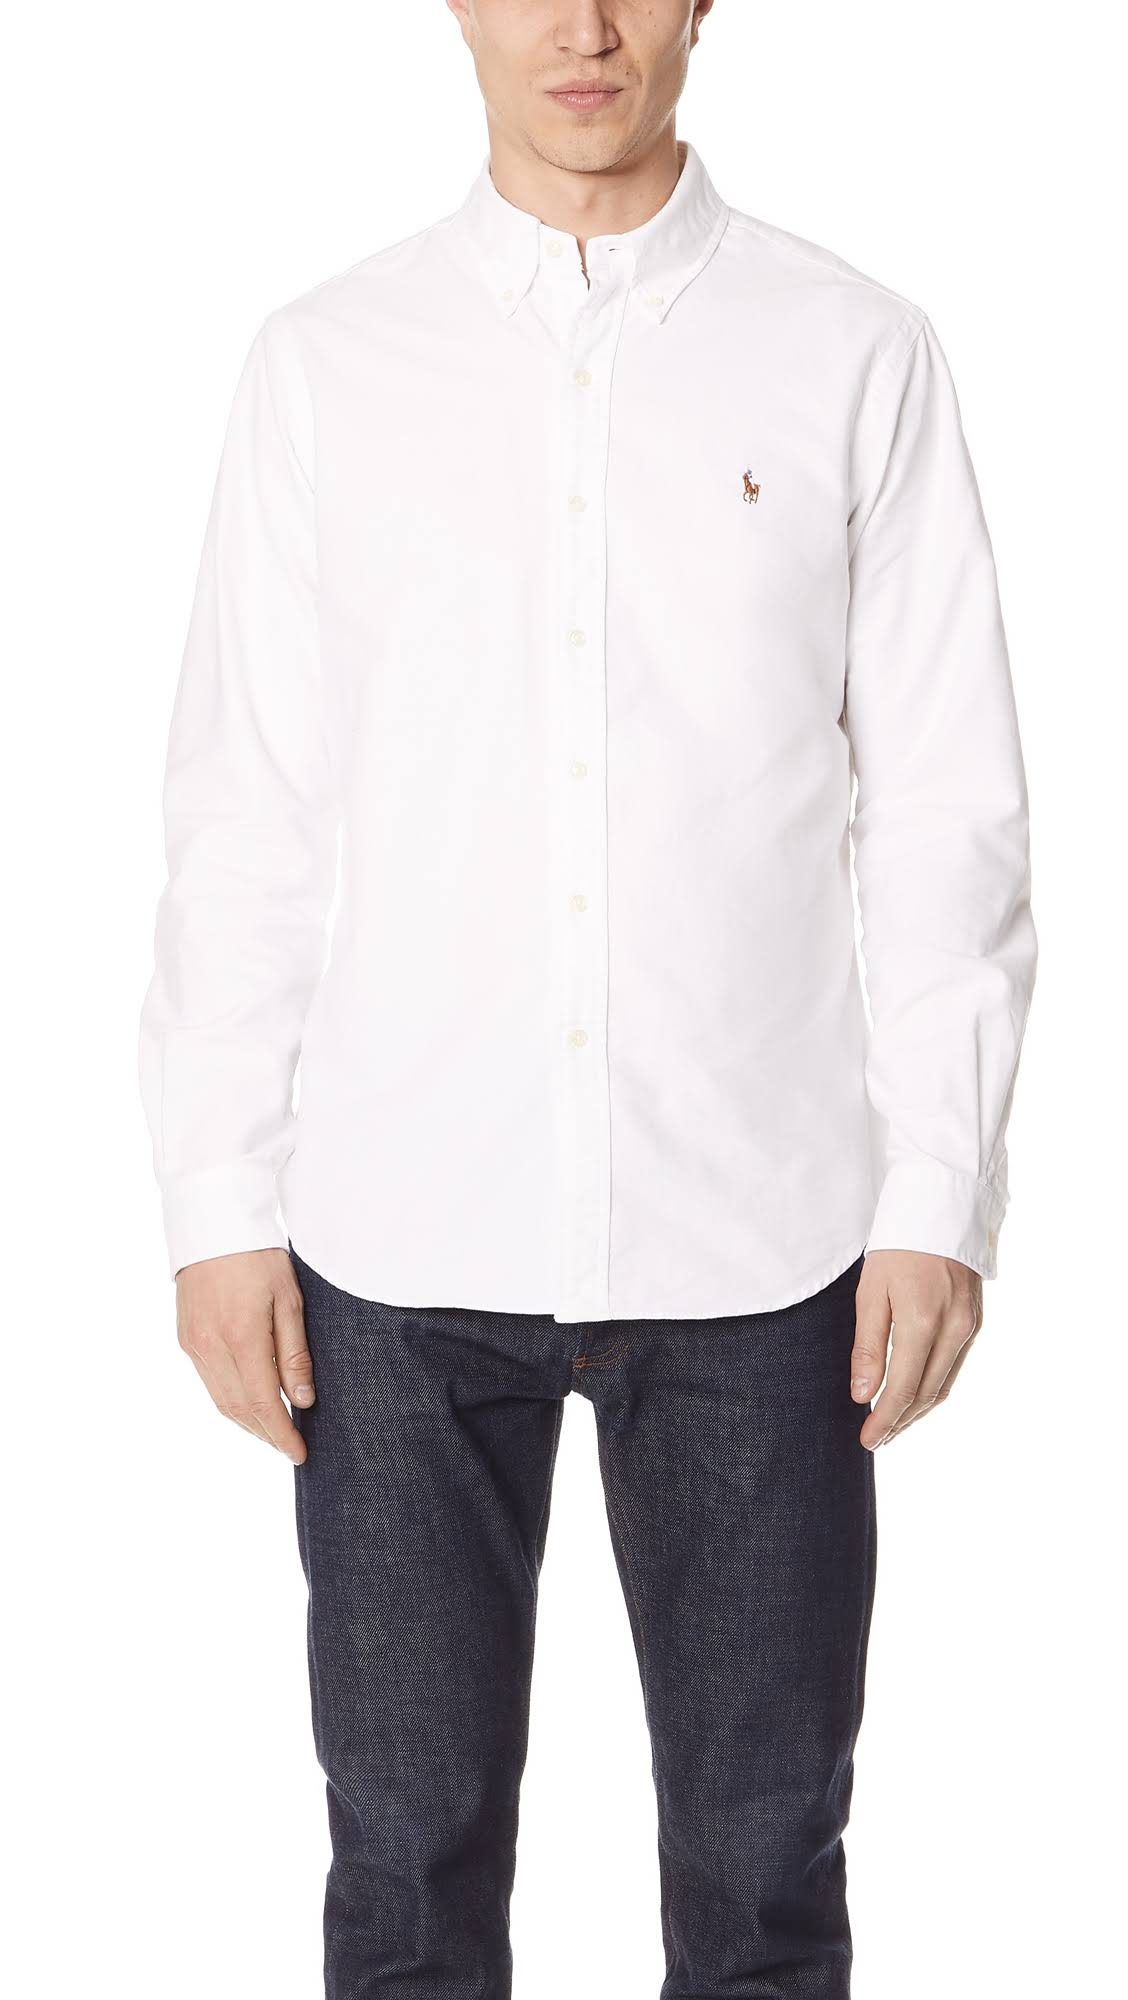 Blanca Polo Camisa Oxford Ralph Lauren vg0qU